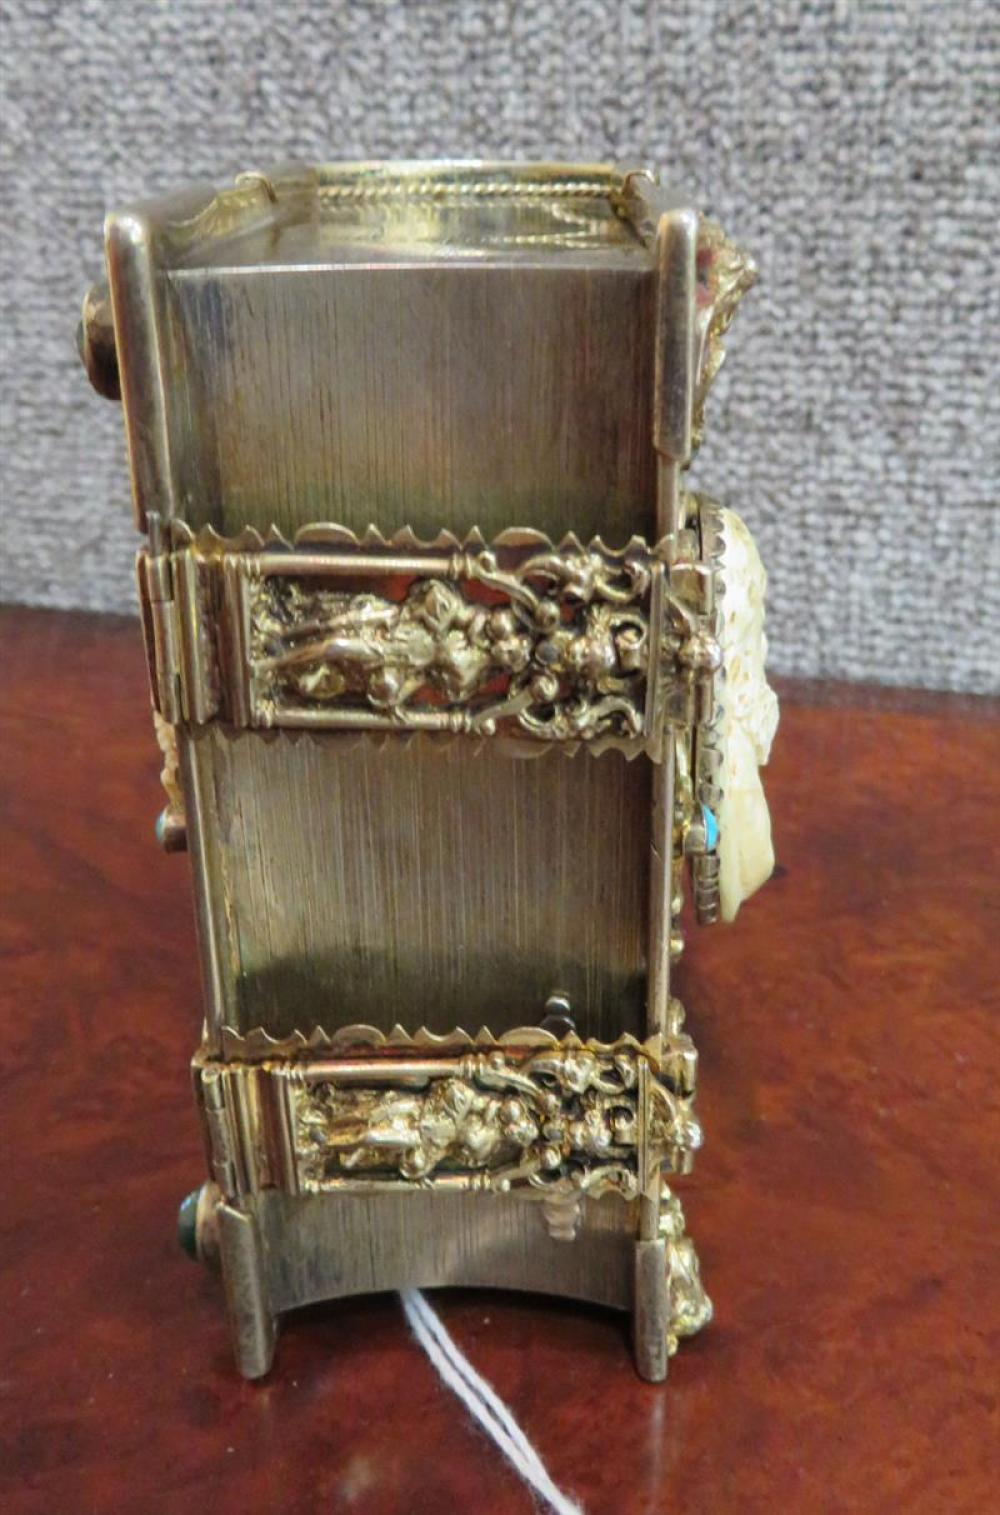 Continental book-form singing bird box, attributed to Karl Griesbaum